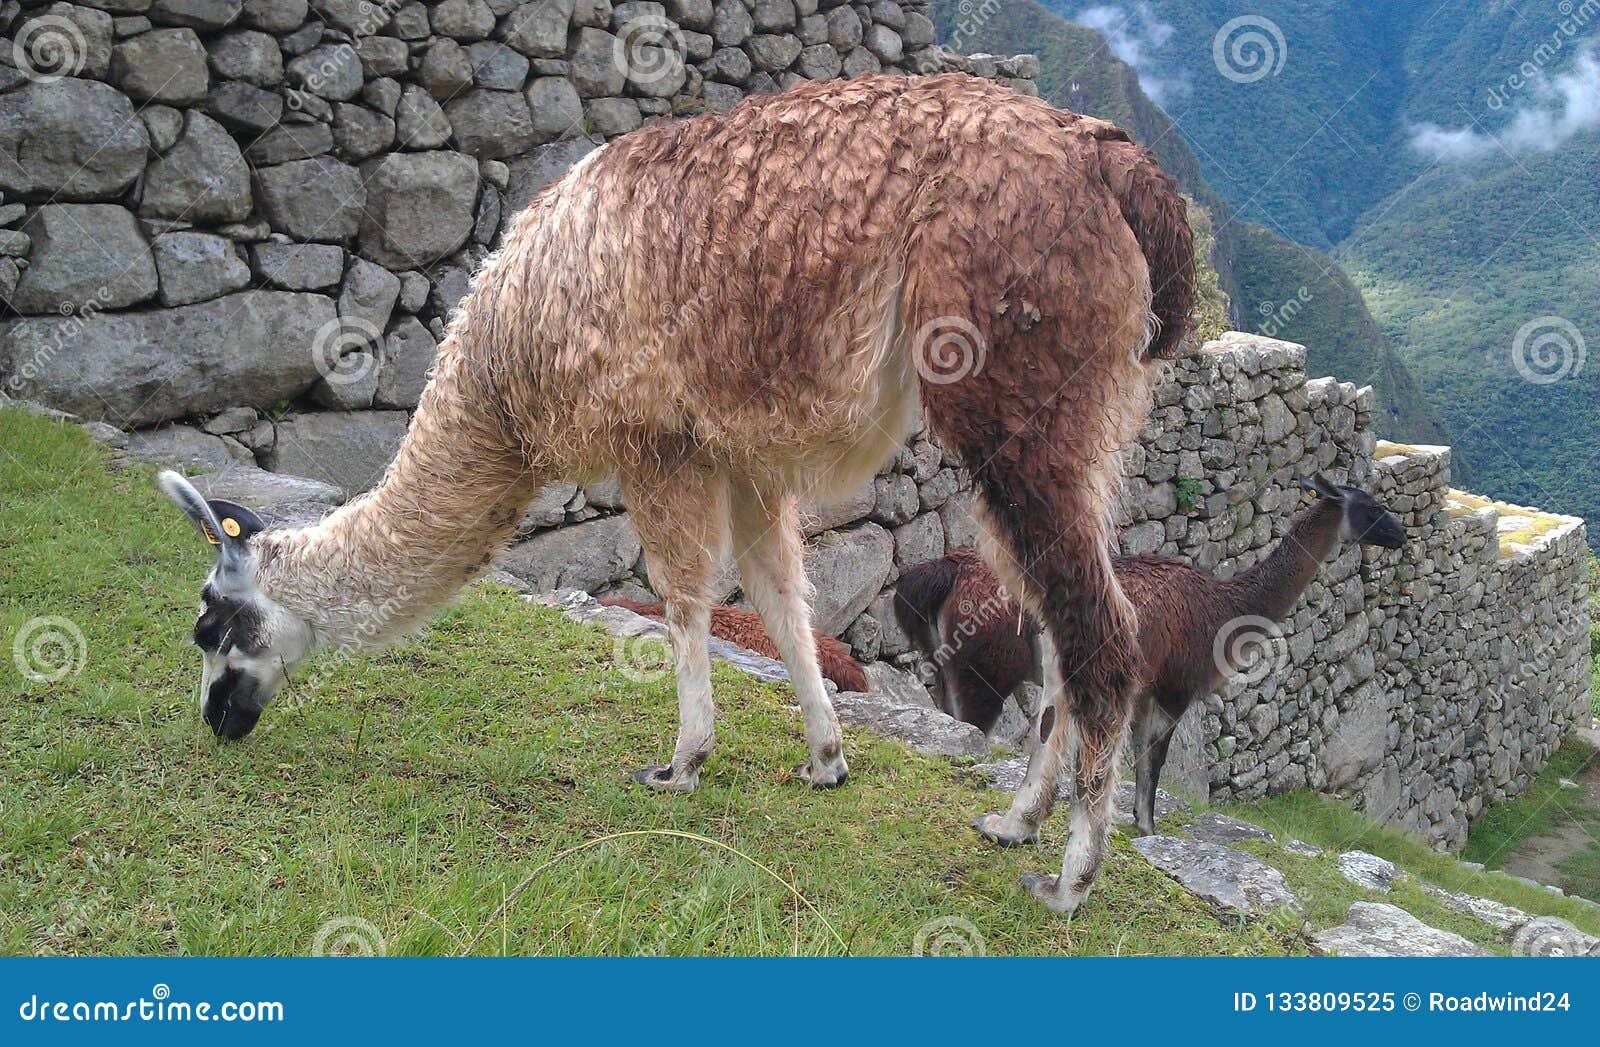 Lamy Mach Picchu